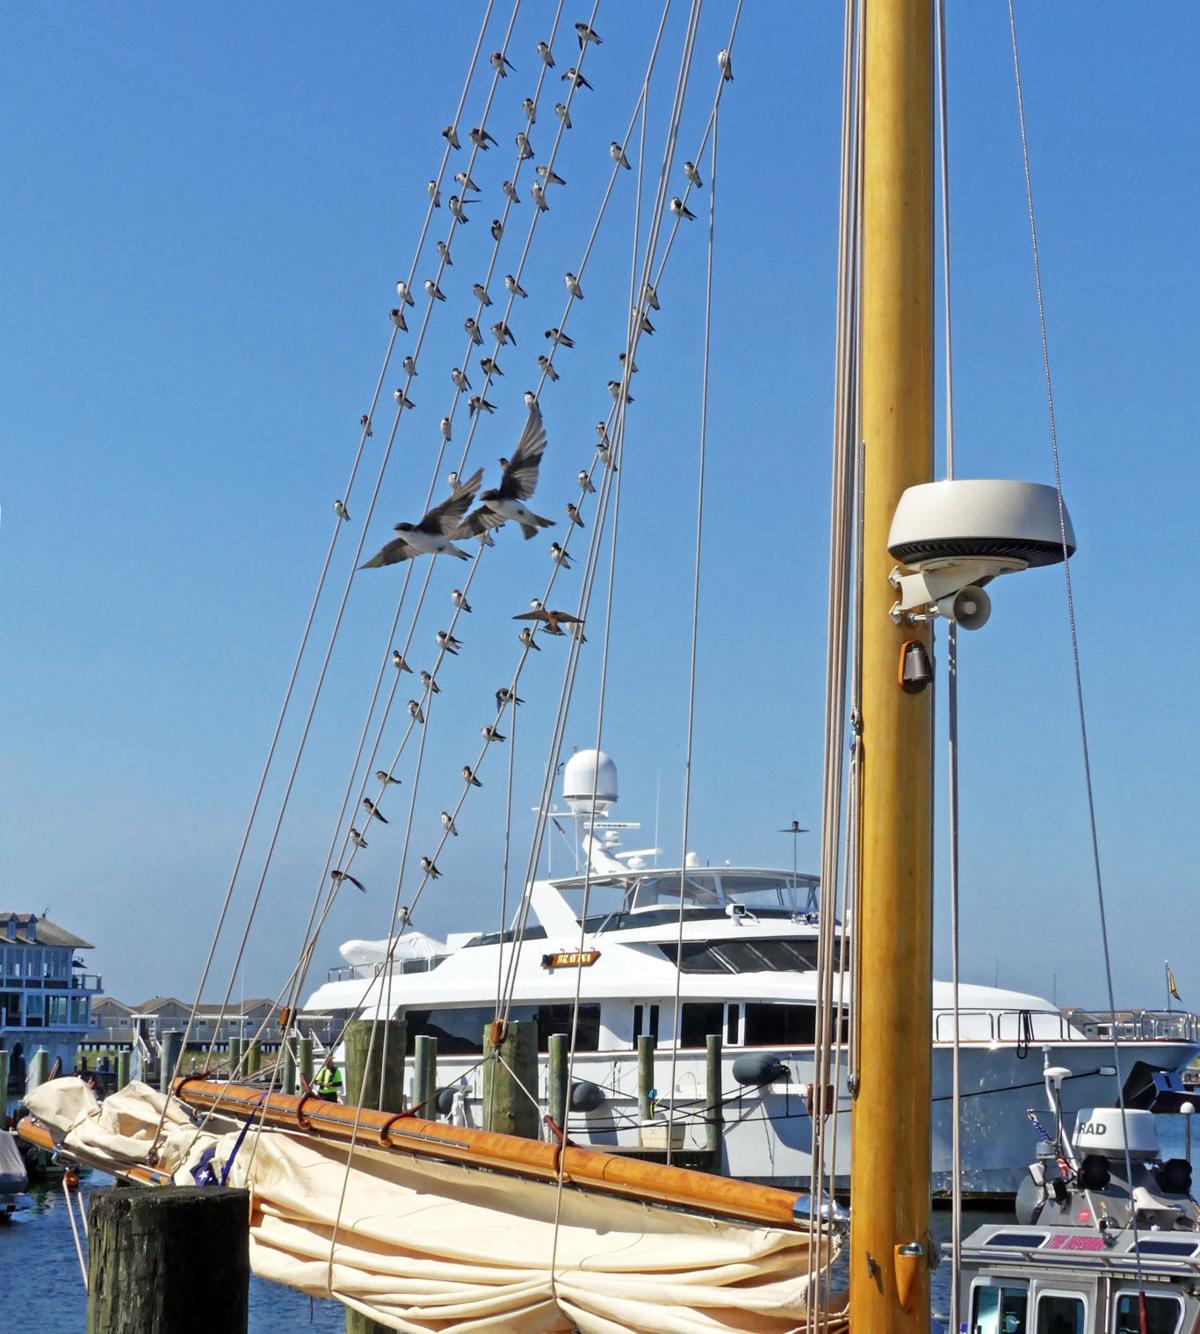 081519 WES Shorebirds roost in sailboat rigging 89.JPG